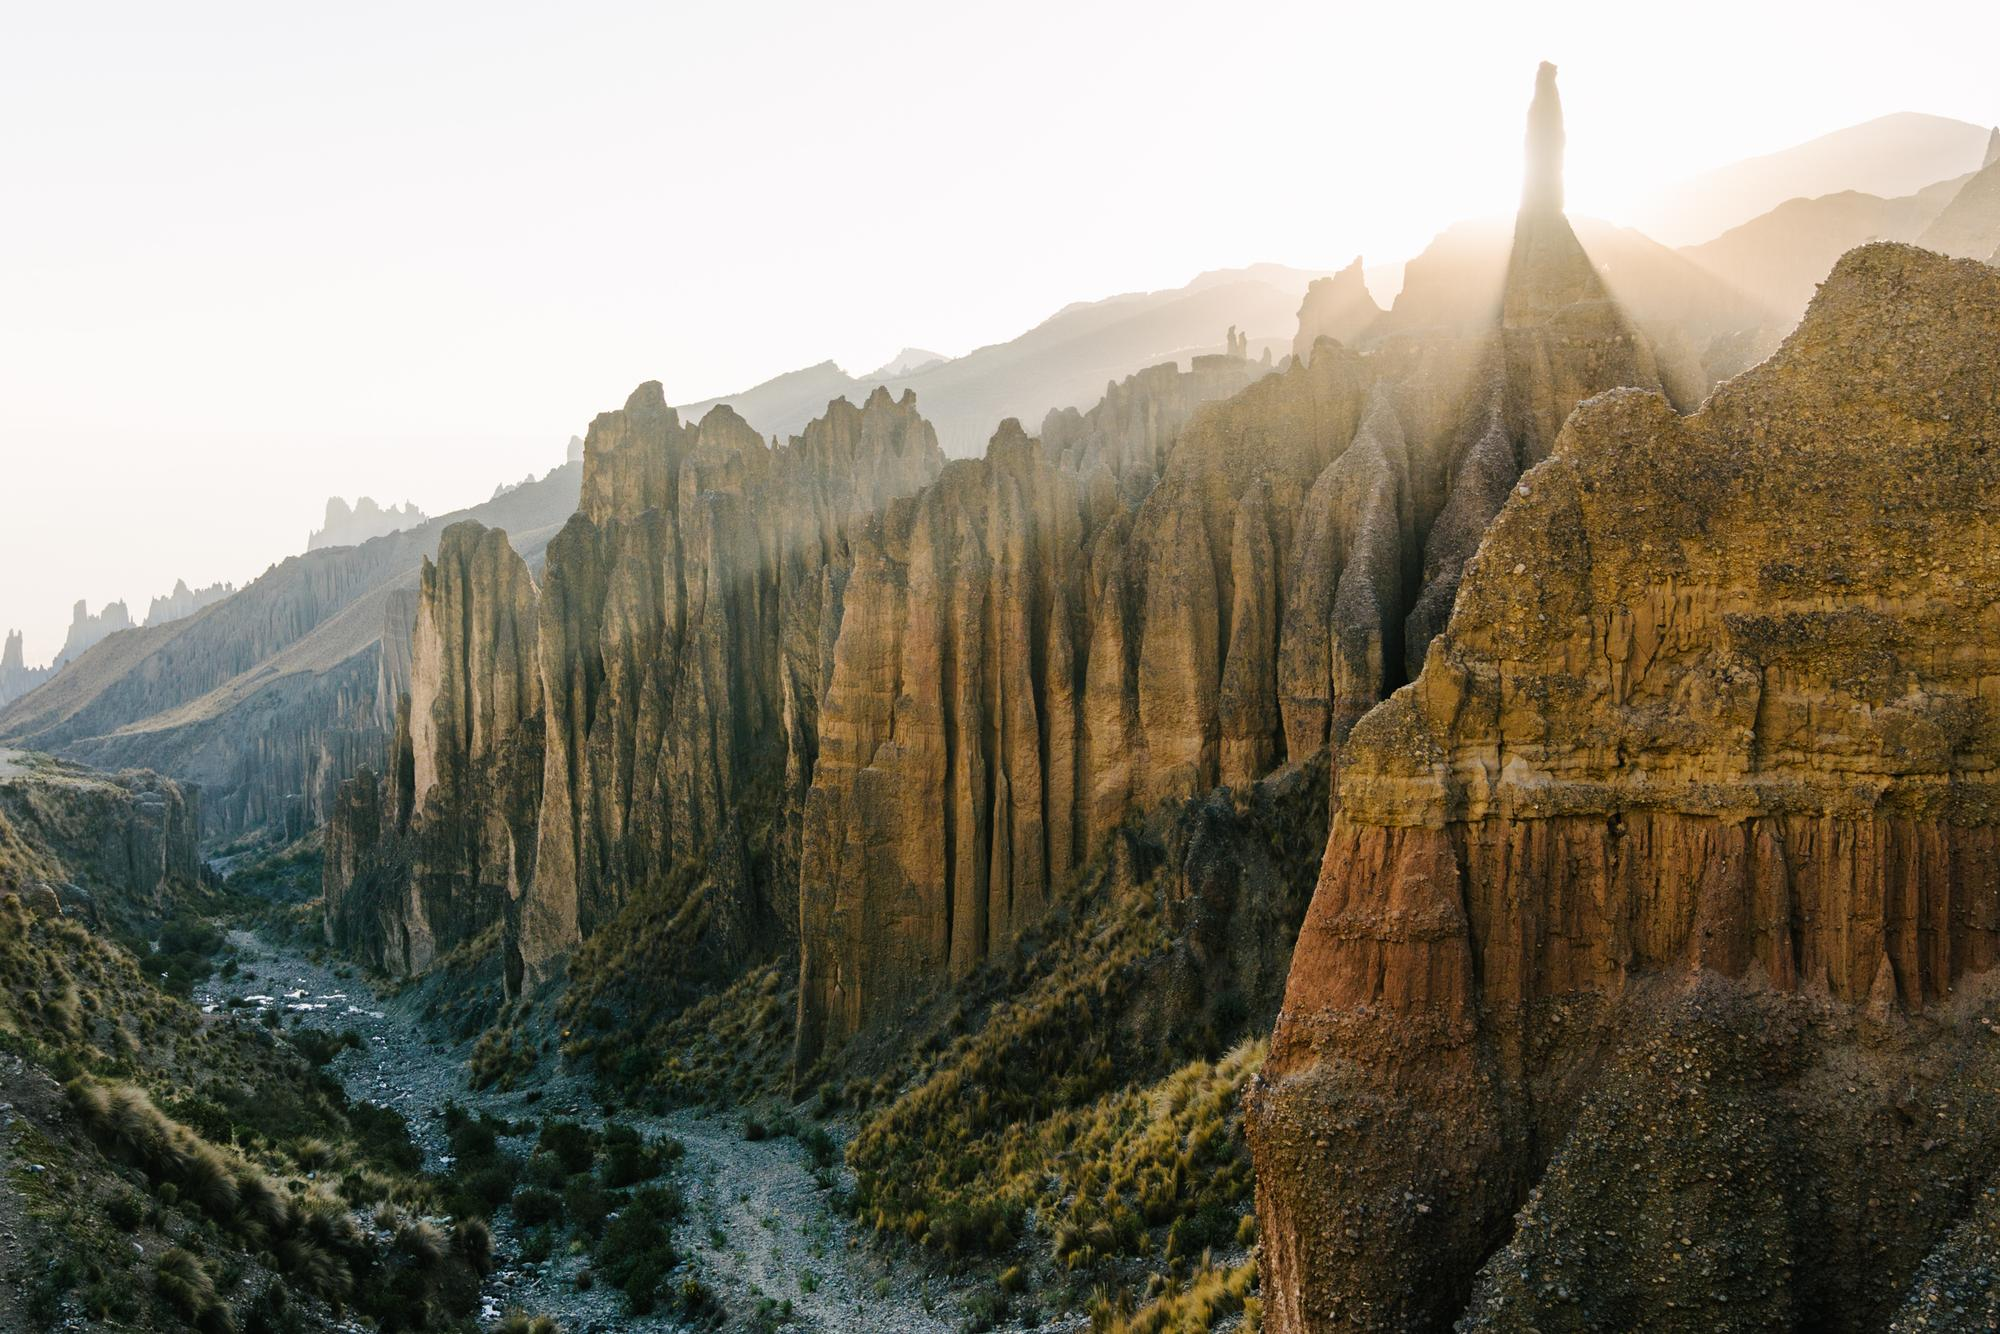 The Animas Trail